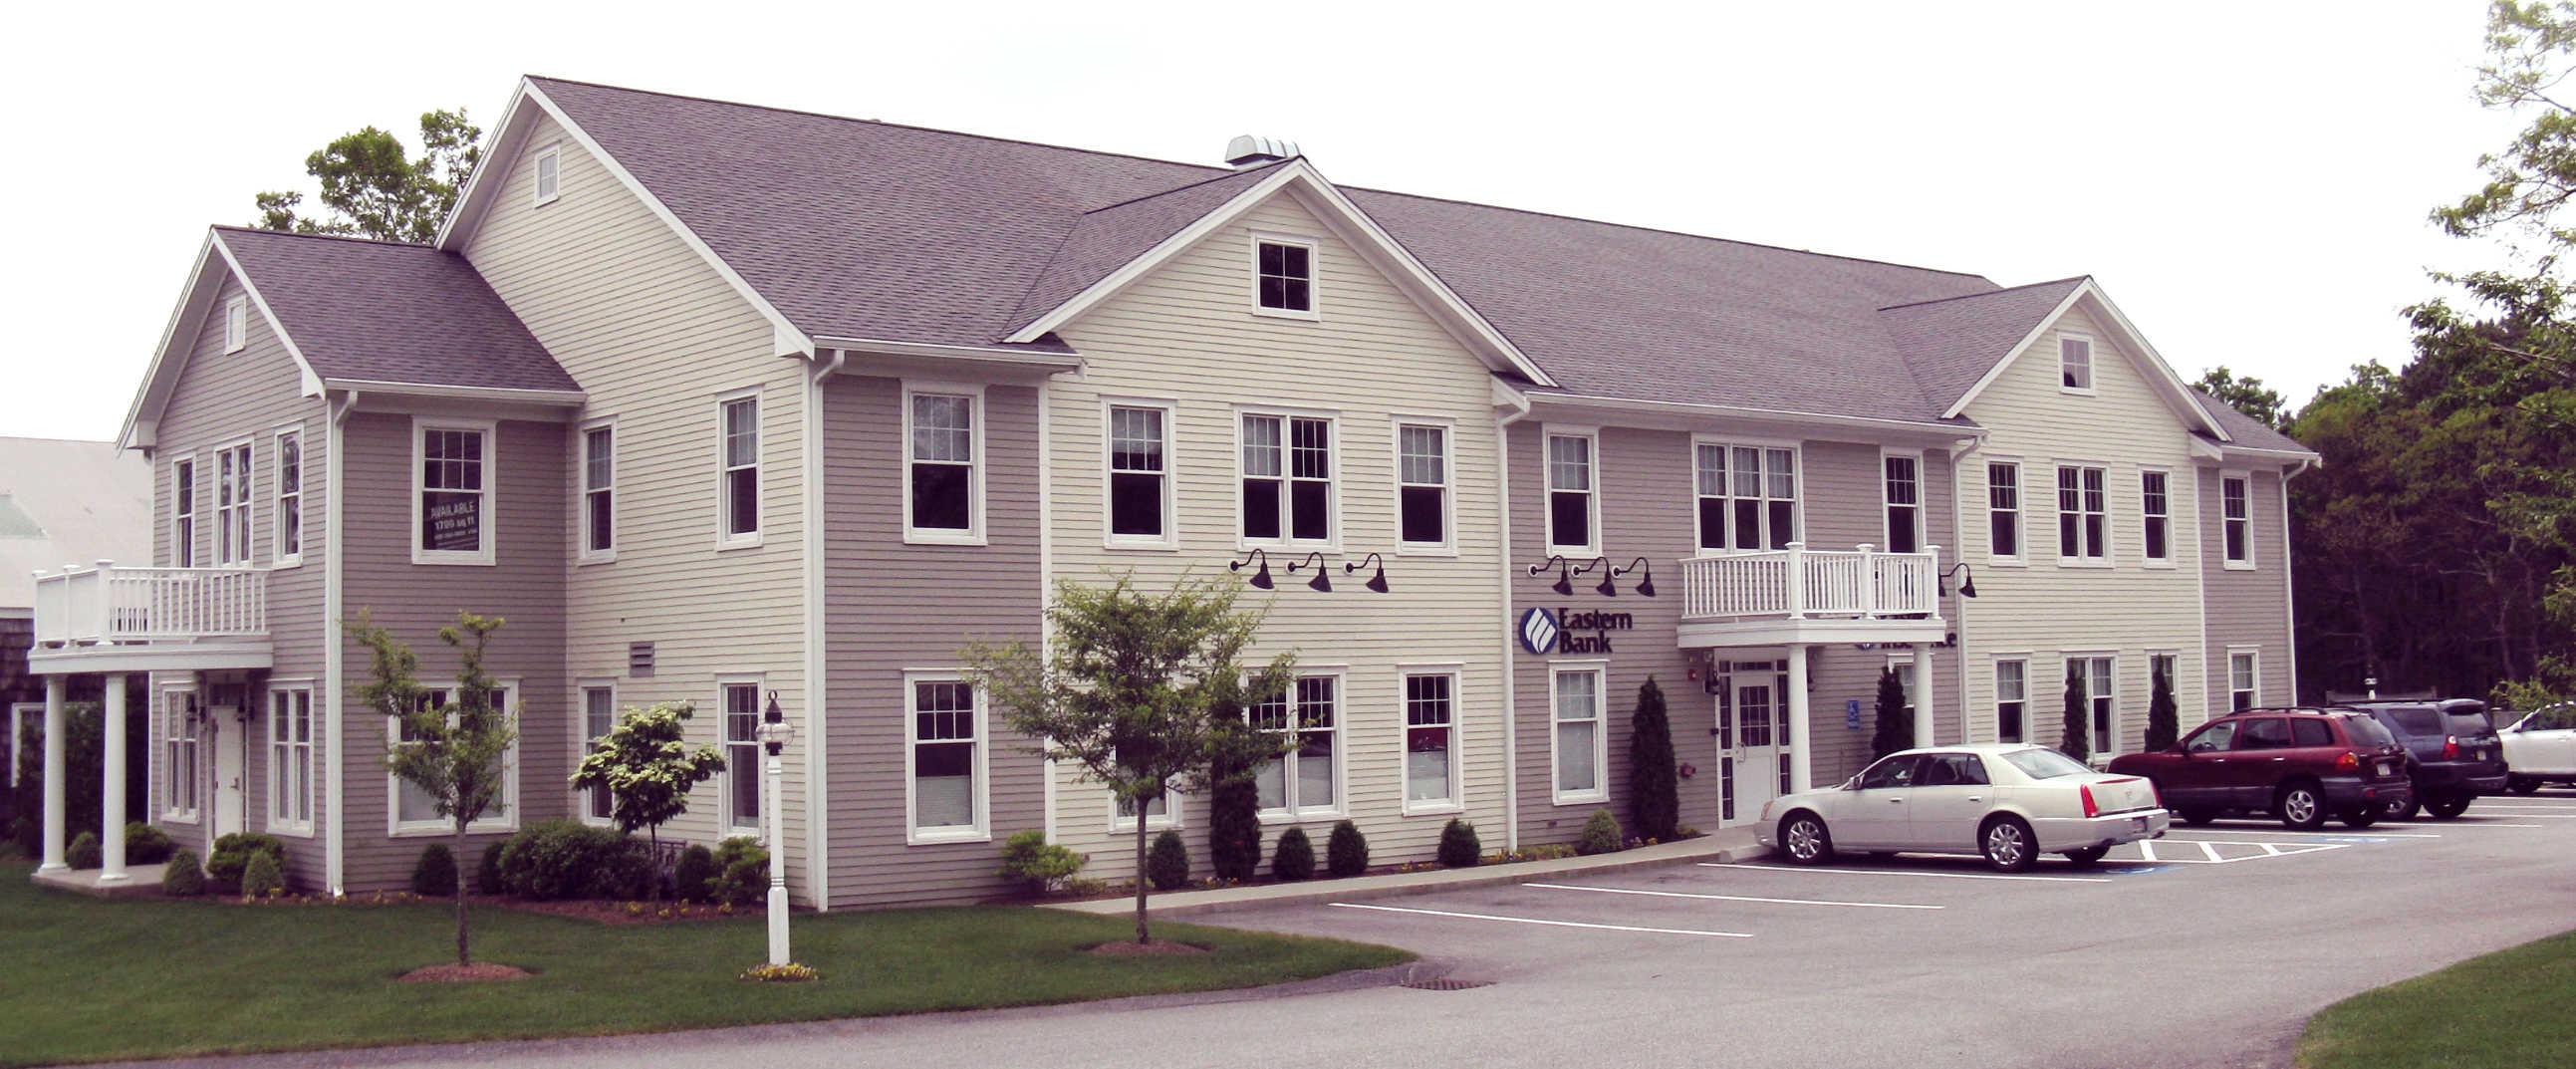 Fullsize Of Cape Cod Homes